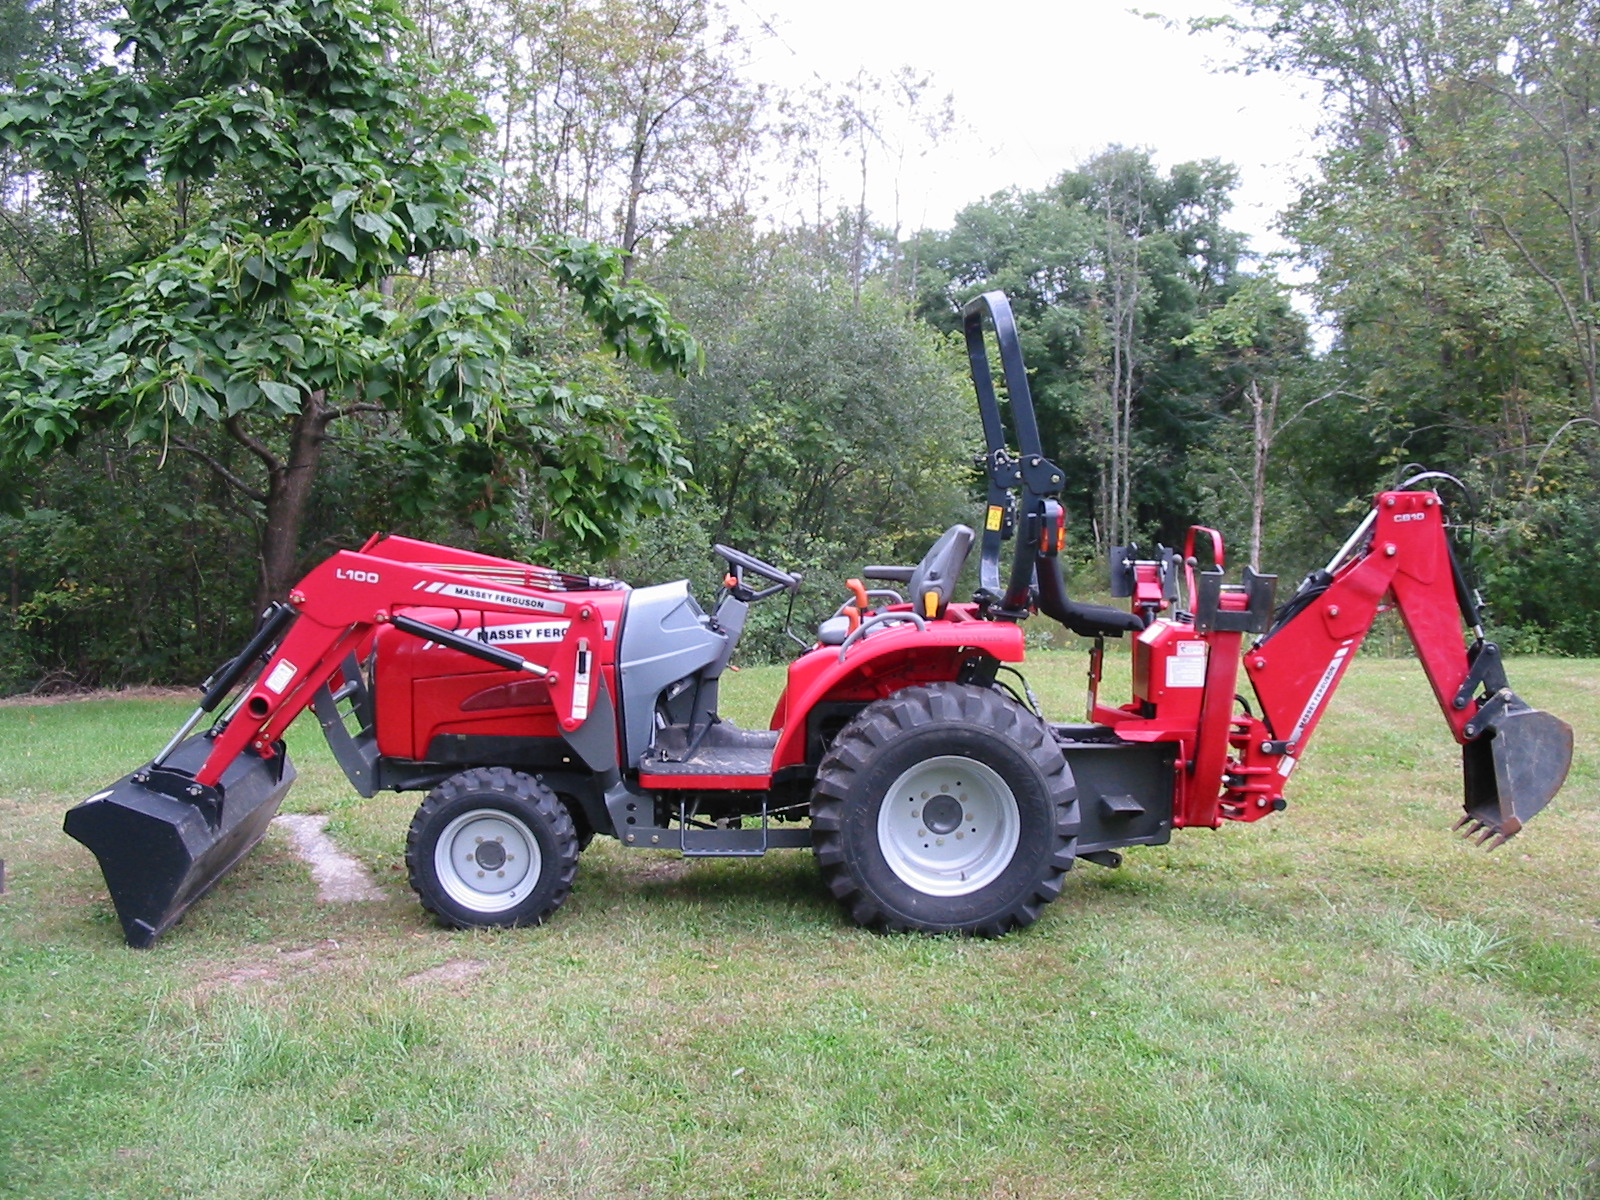 Massey Ferguson Tractor Loader Backhoe : Massey ferguson tractor loader backhoe iron search